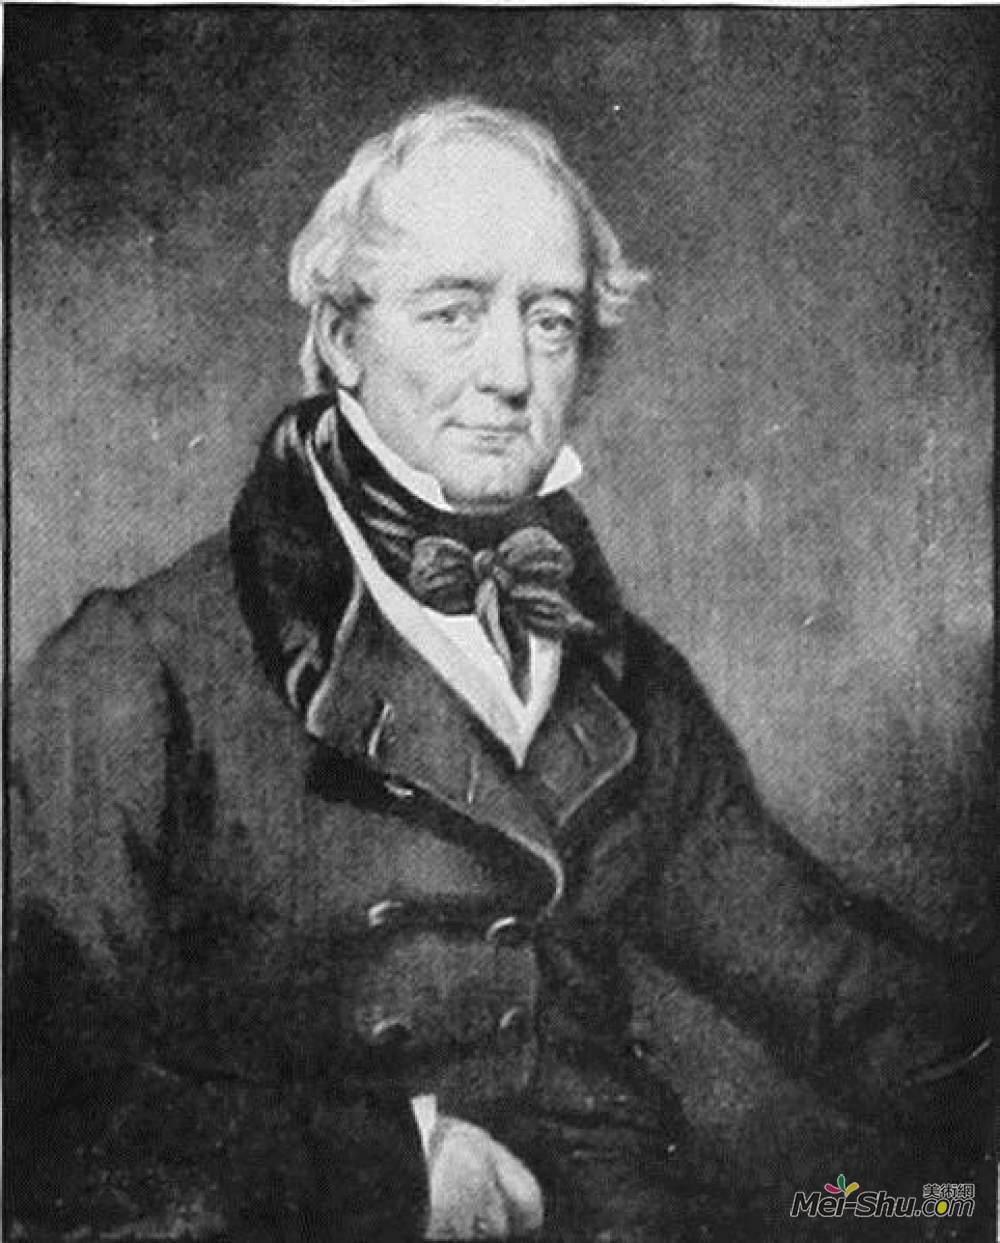 查爾斯·特爾納(Charles Turner)